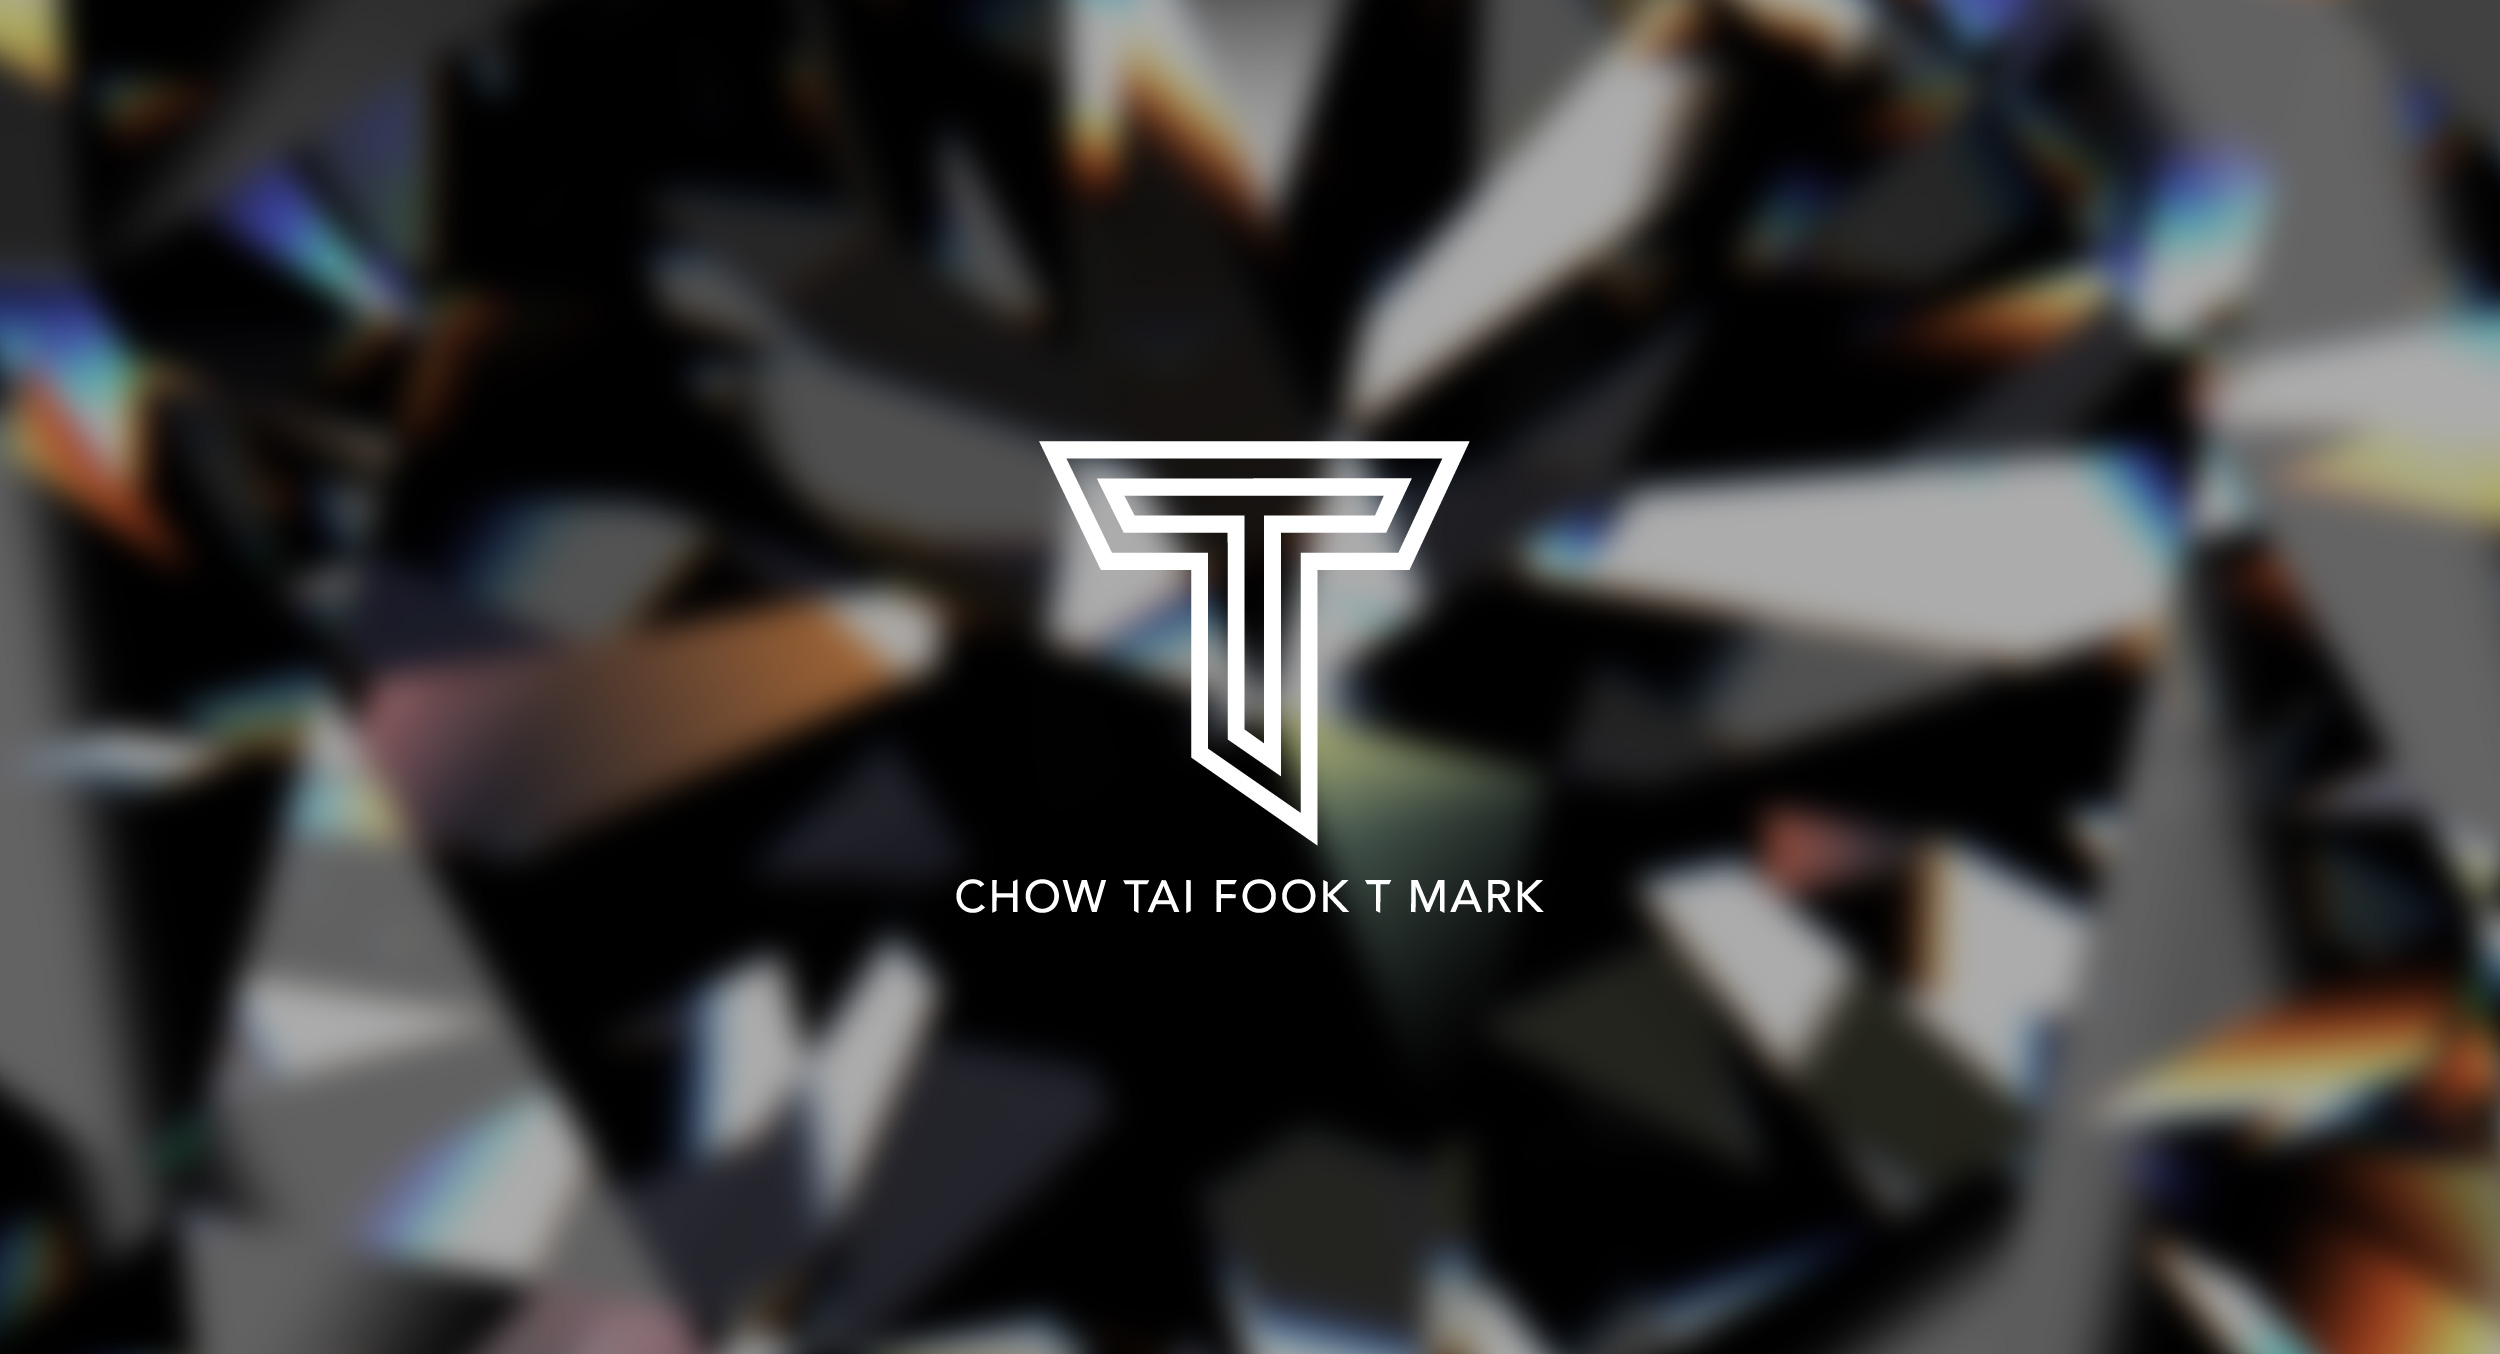 chow tai fook t mark